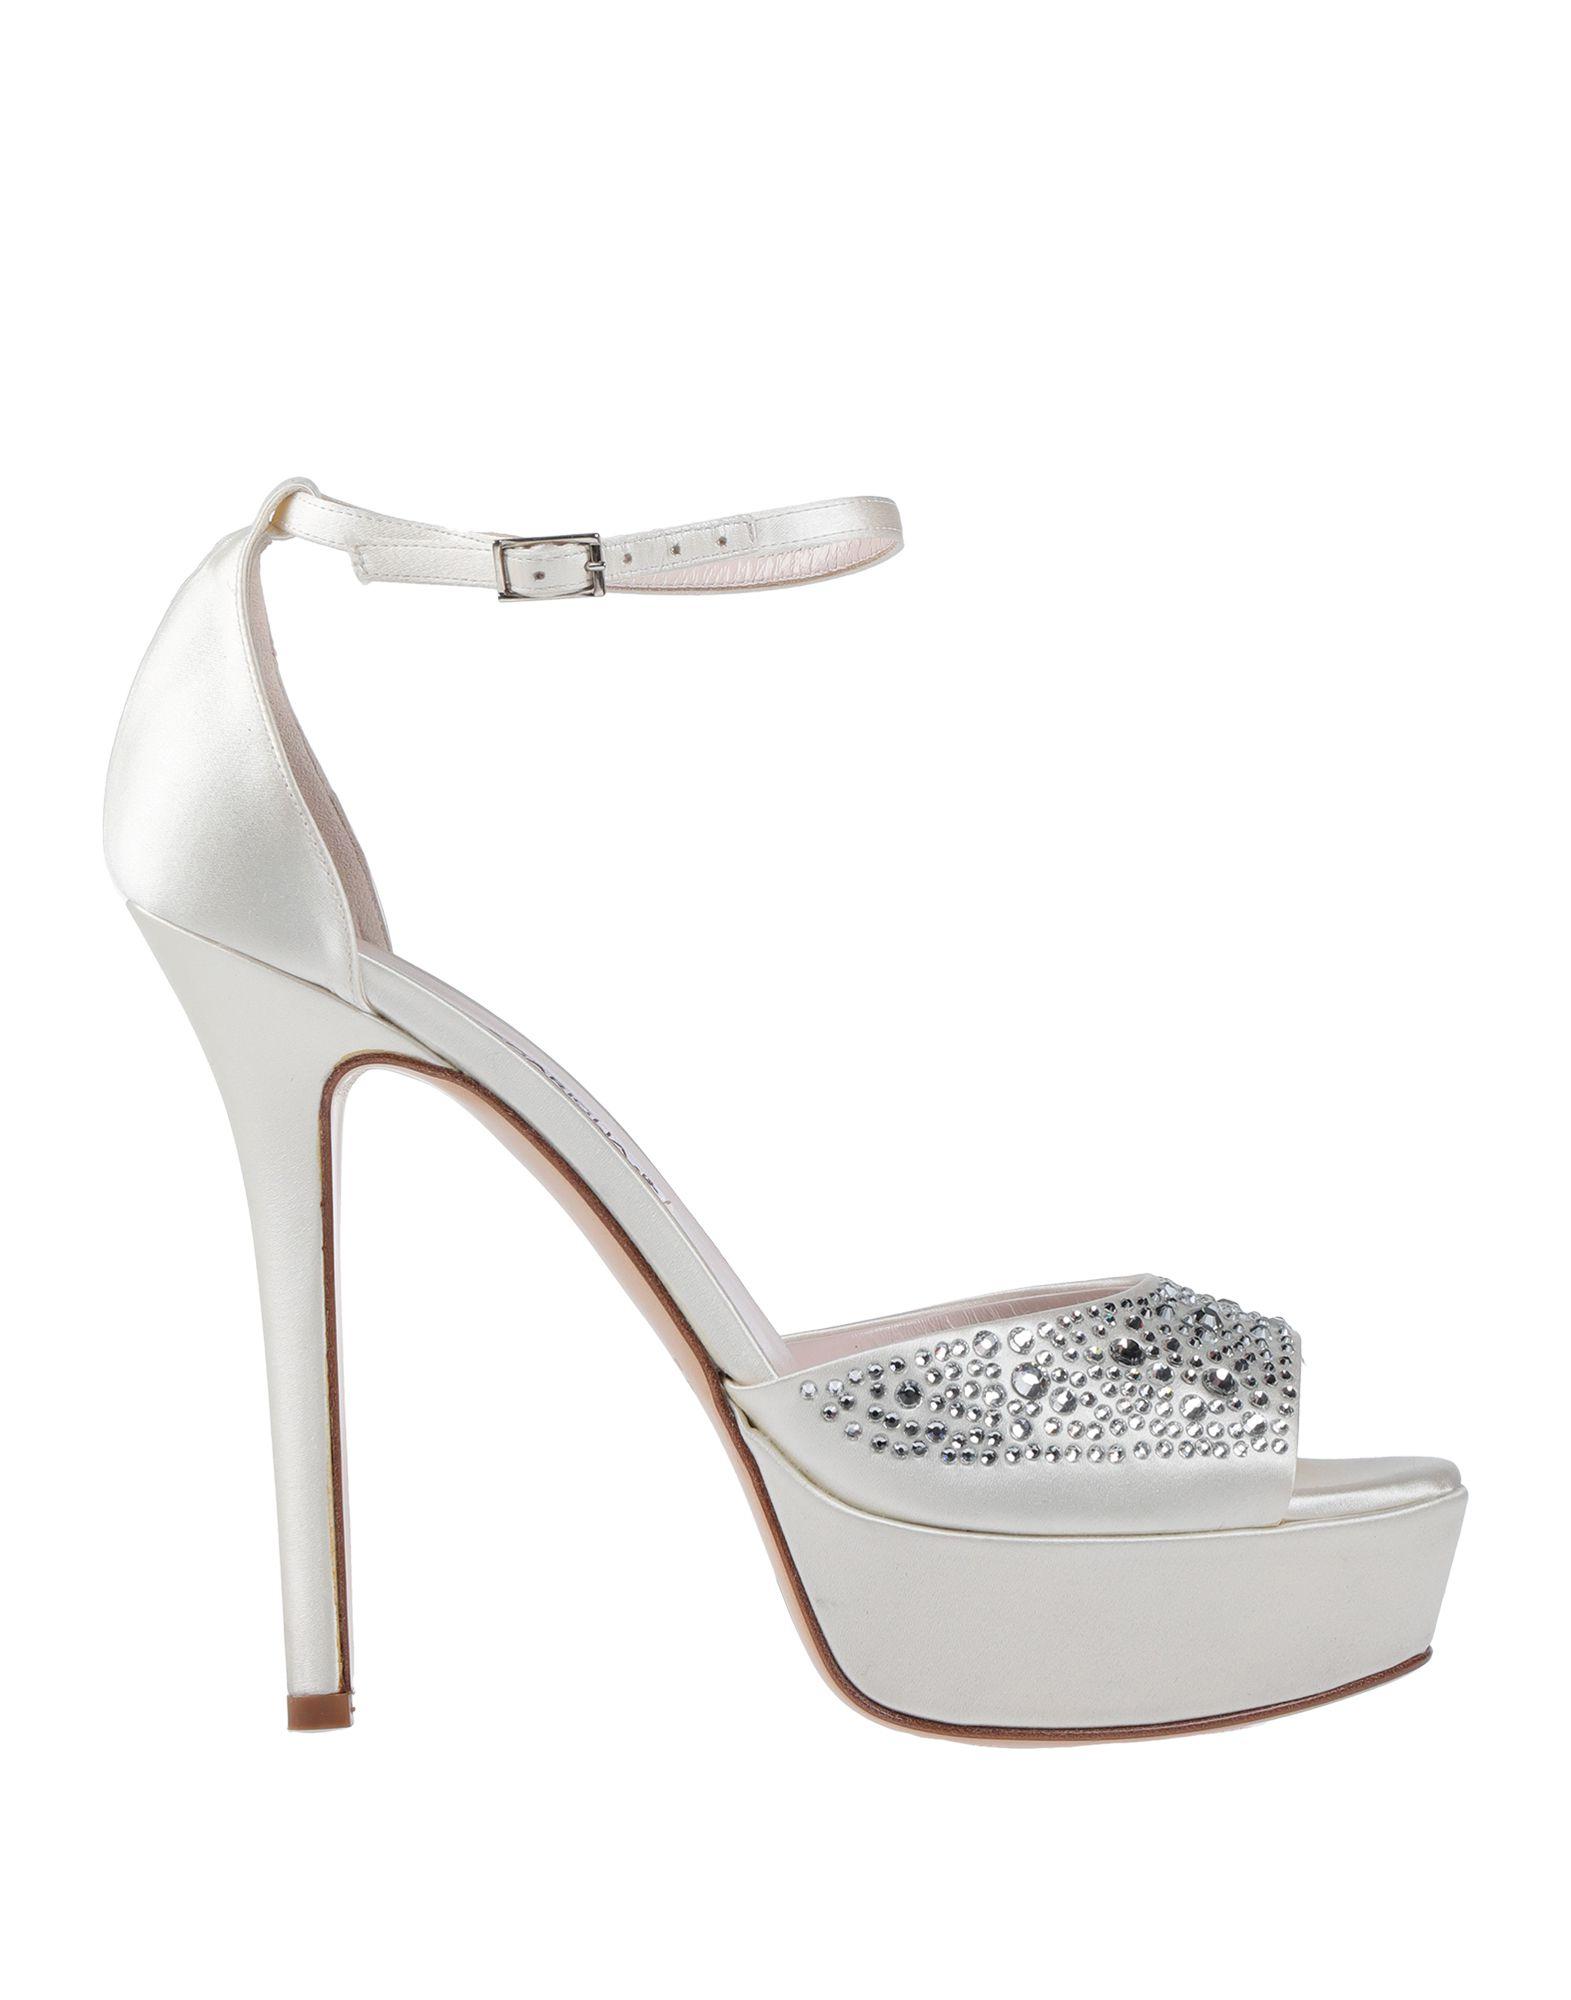 Guido Sgariglia Sandals - Women Guido Sgariglia Sandals online on 11550042BI  United Kingdom - 11550042BI on 43b4eb